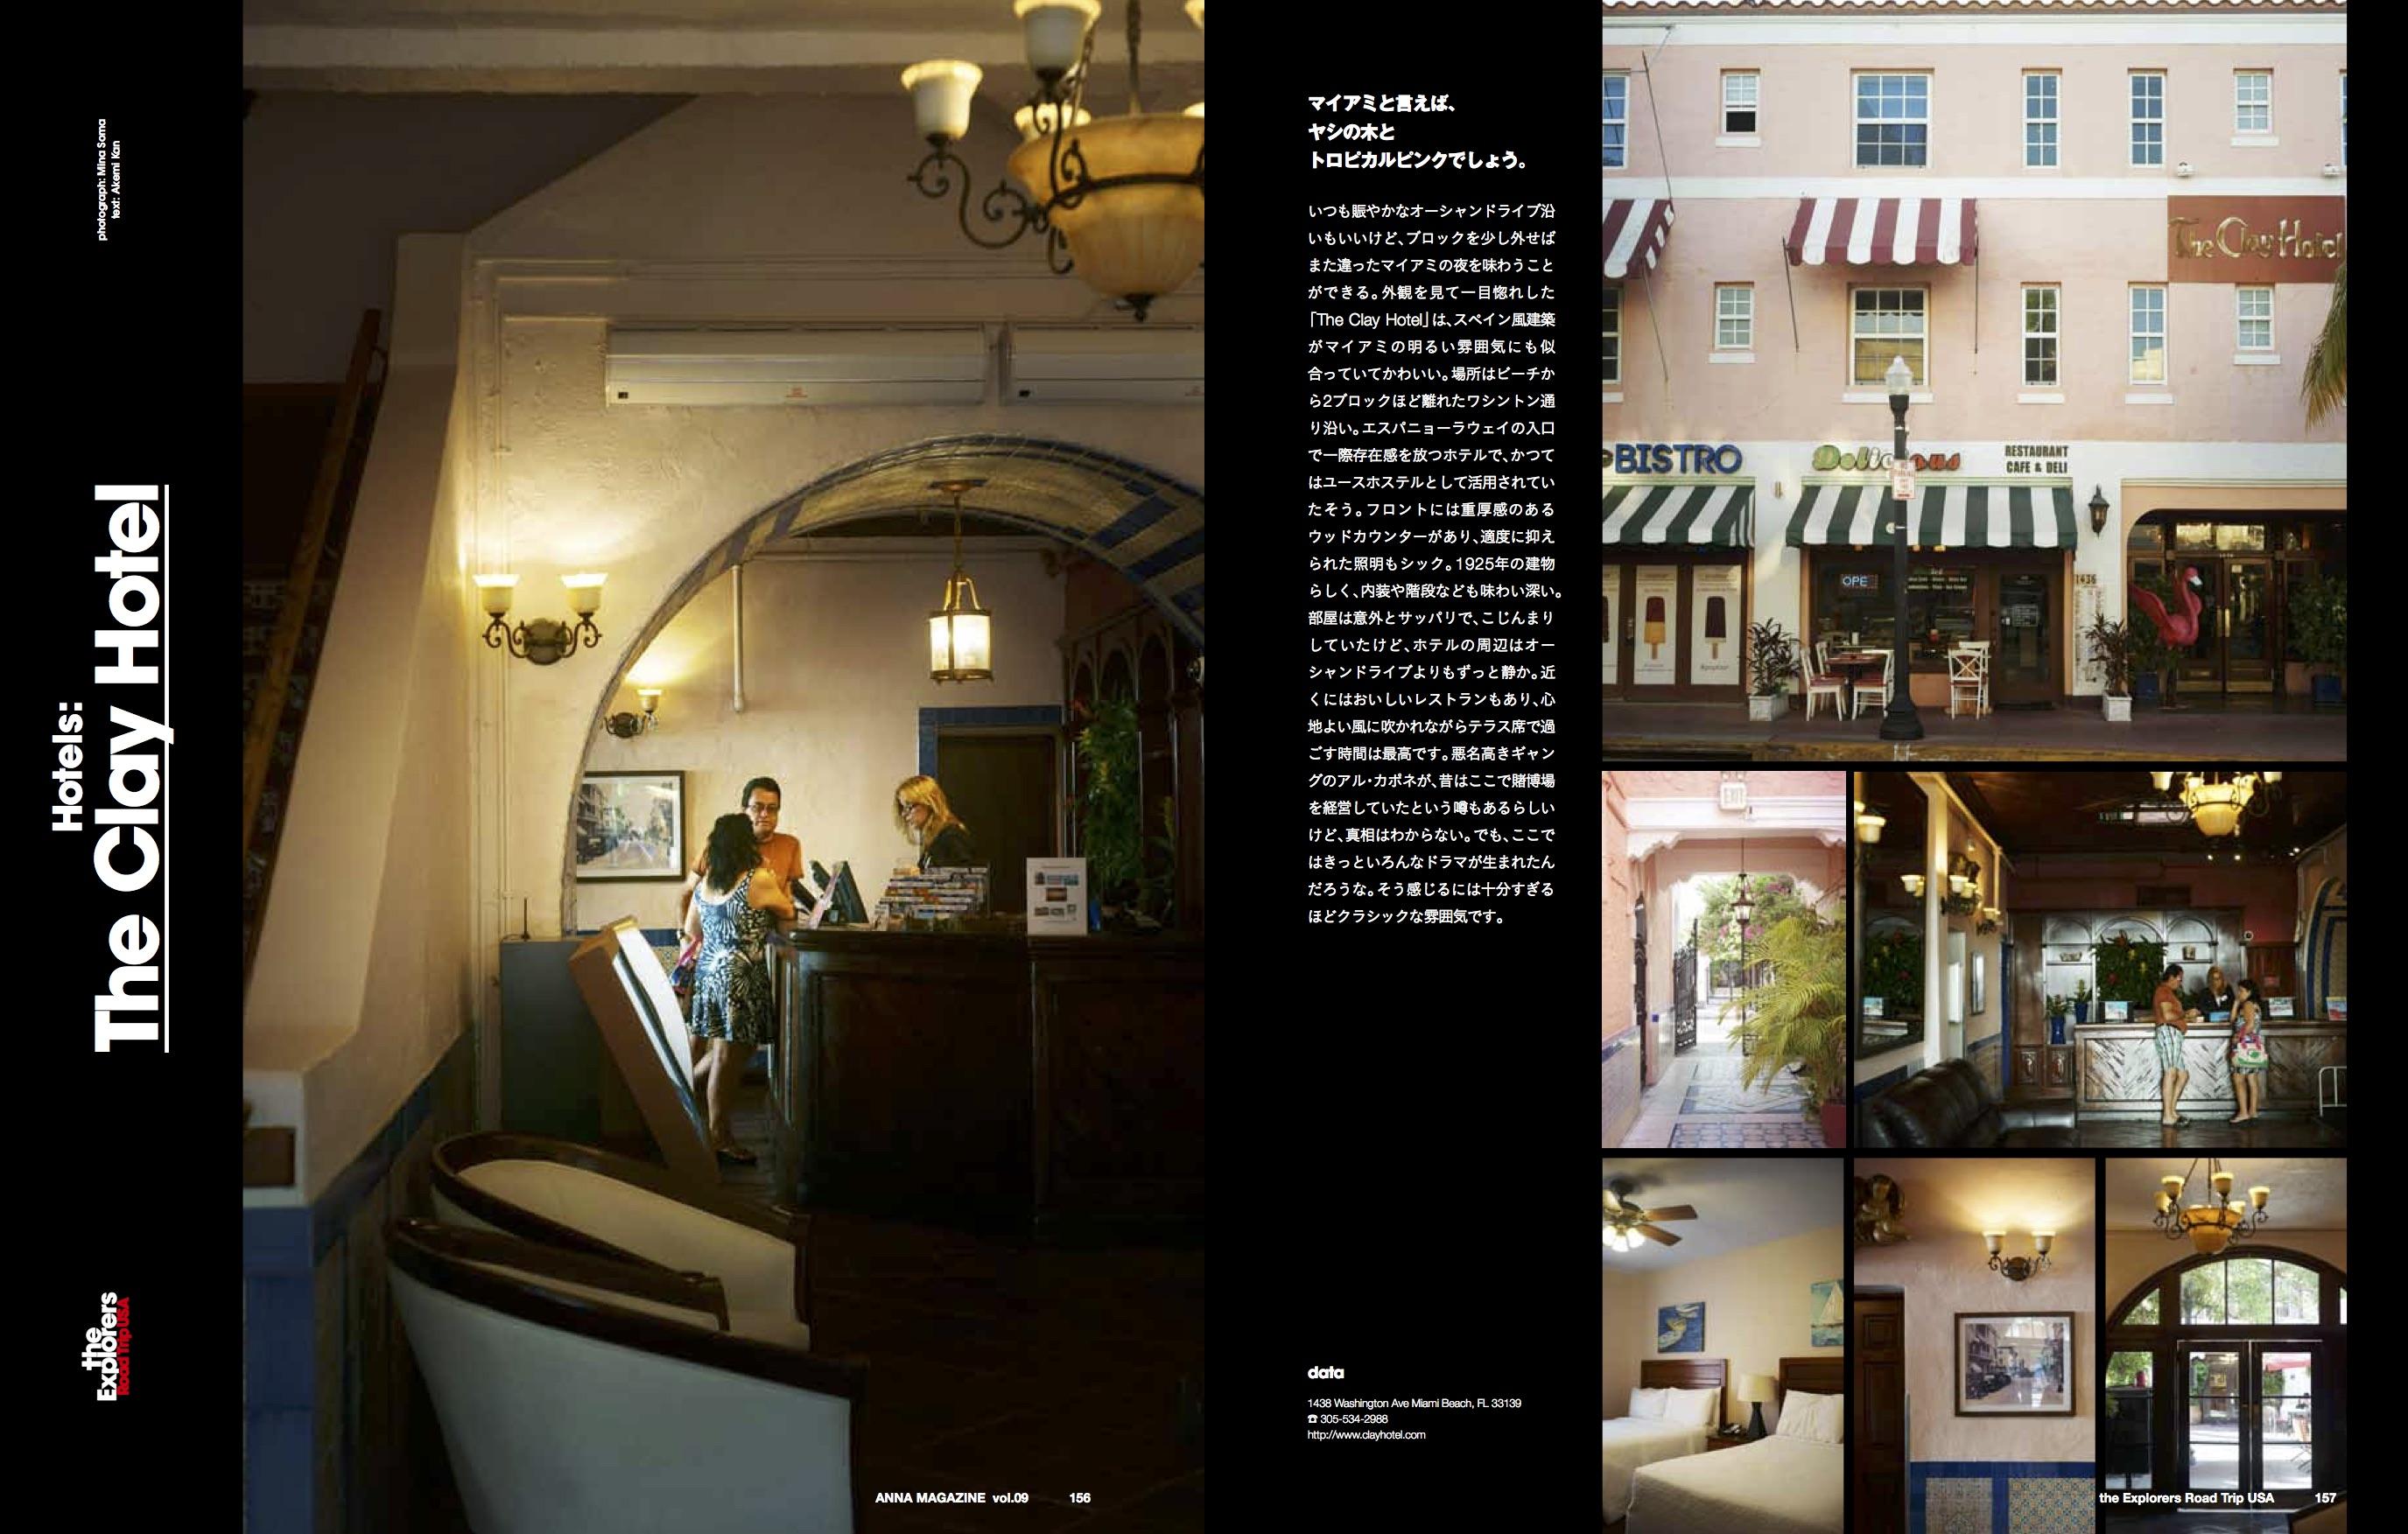 anna magazine vol.9 P78